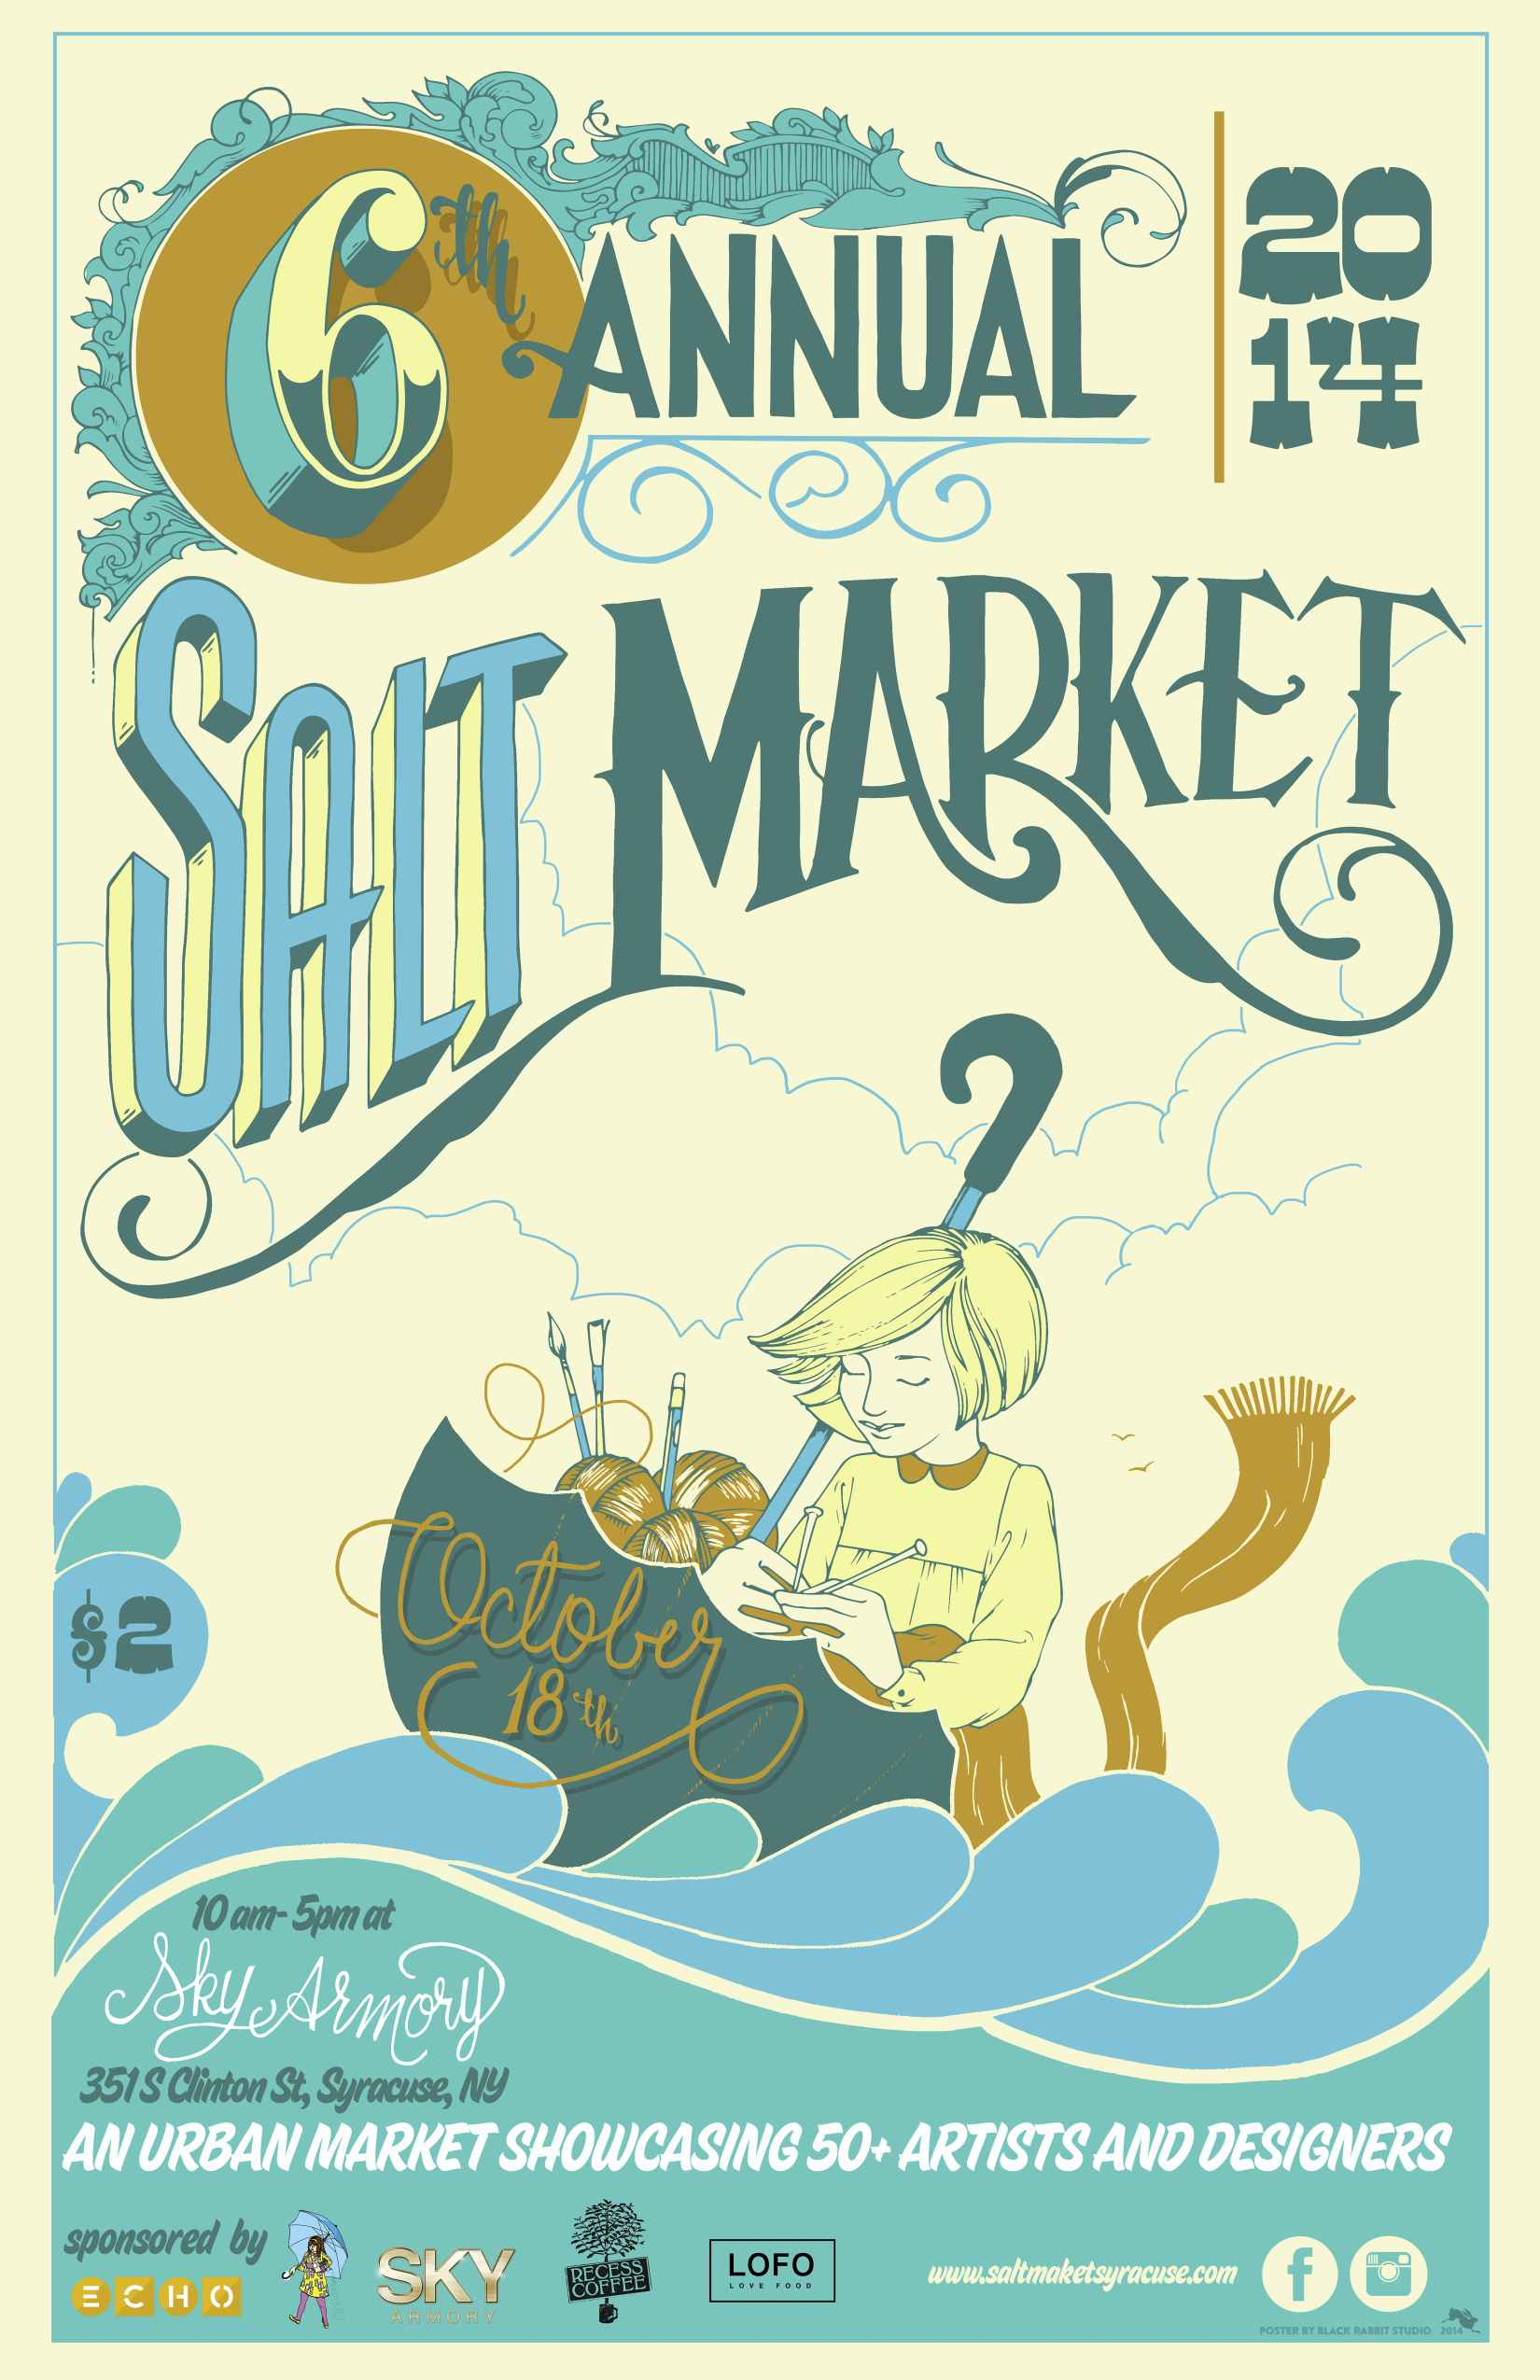 Visit Smock at the 2014 Syracuse Salt Market!